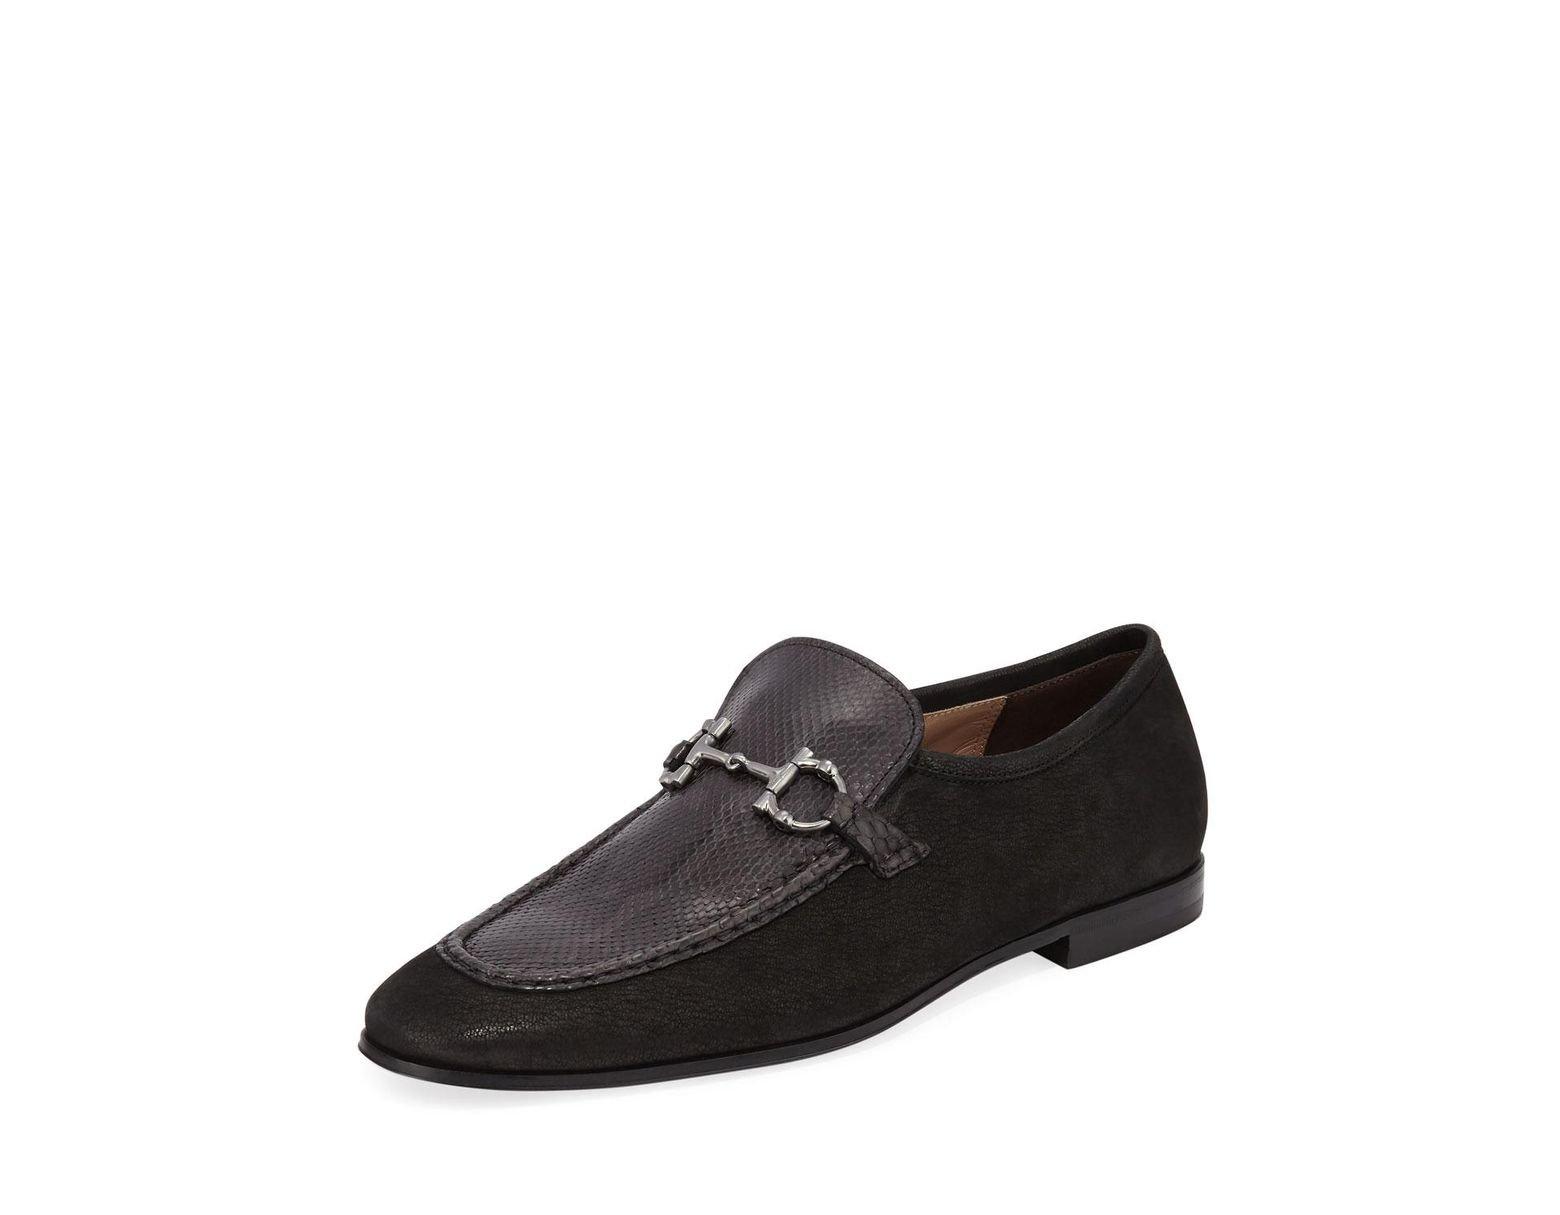 7787f2eda4953 Ferragamo Men's Anderson 2 Leather & Python Bit Loafers in Black for Men -  Lyst